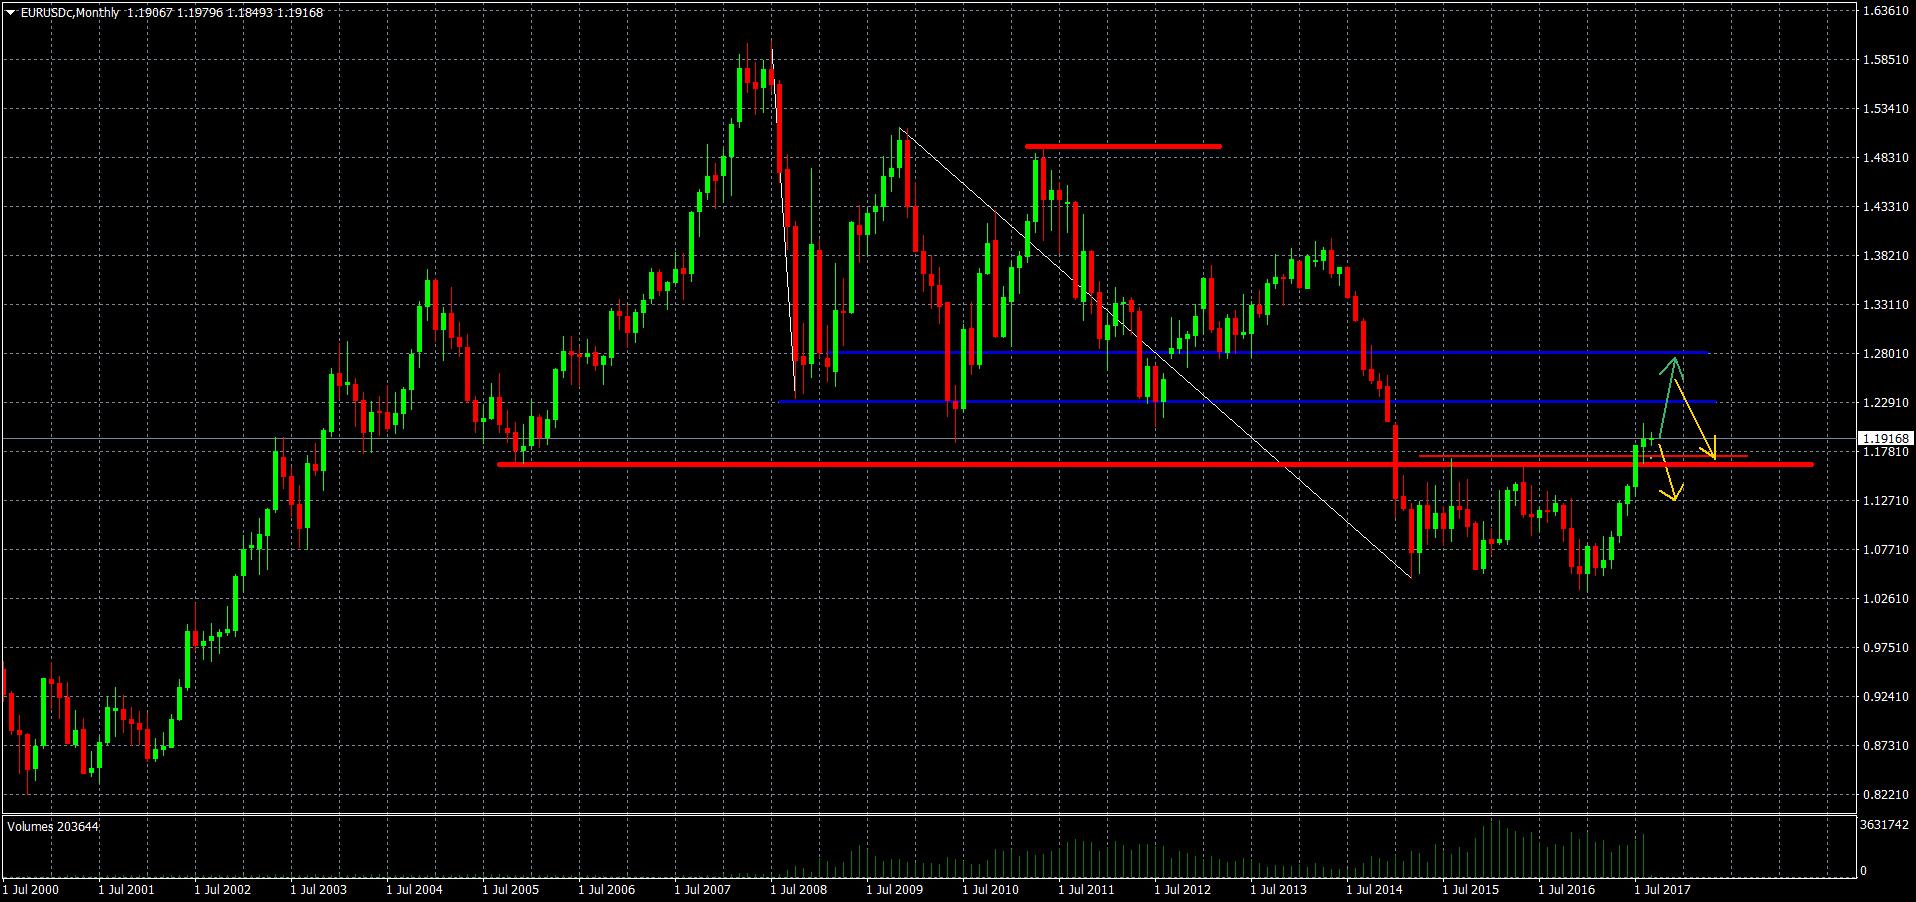 Euro vs USD Monatschart-Analyse